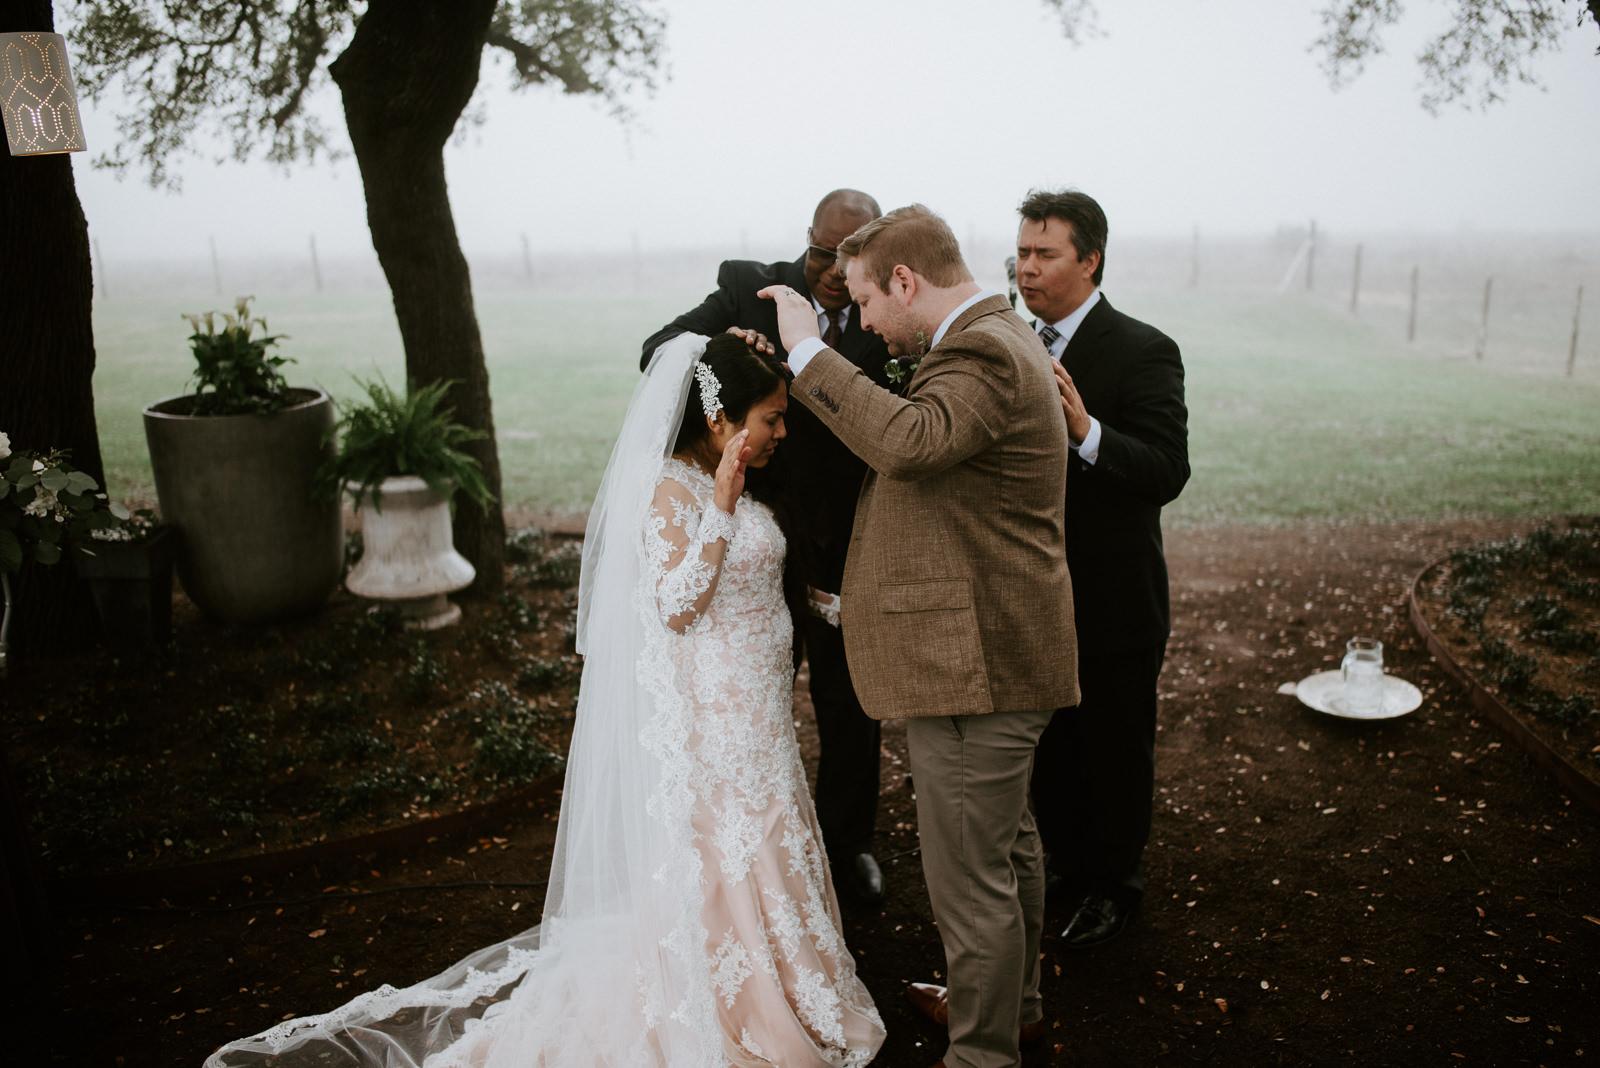 prayer at christian wedding